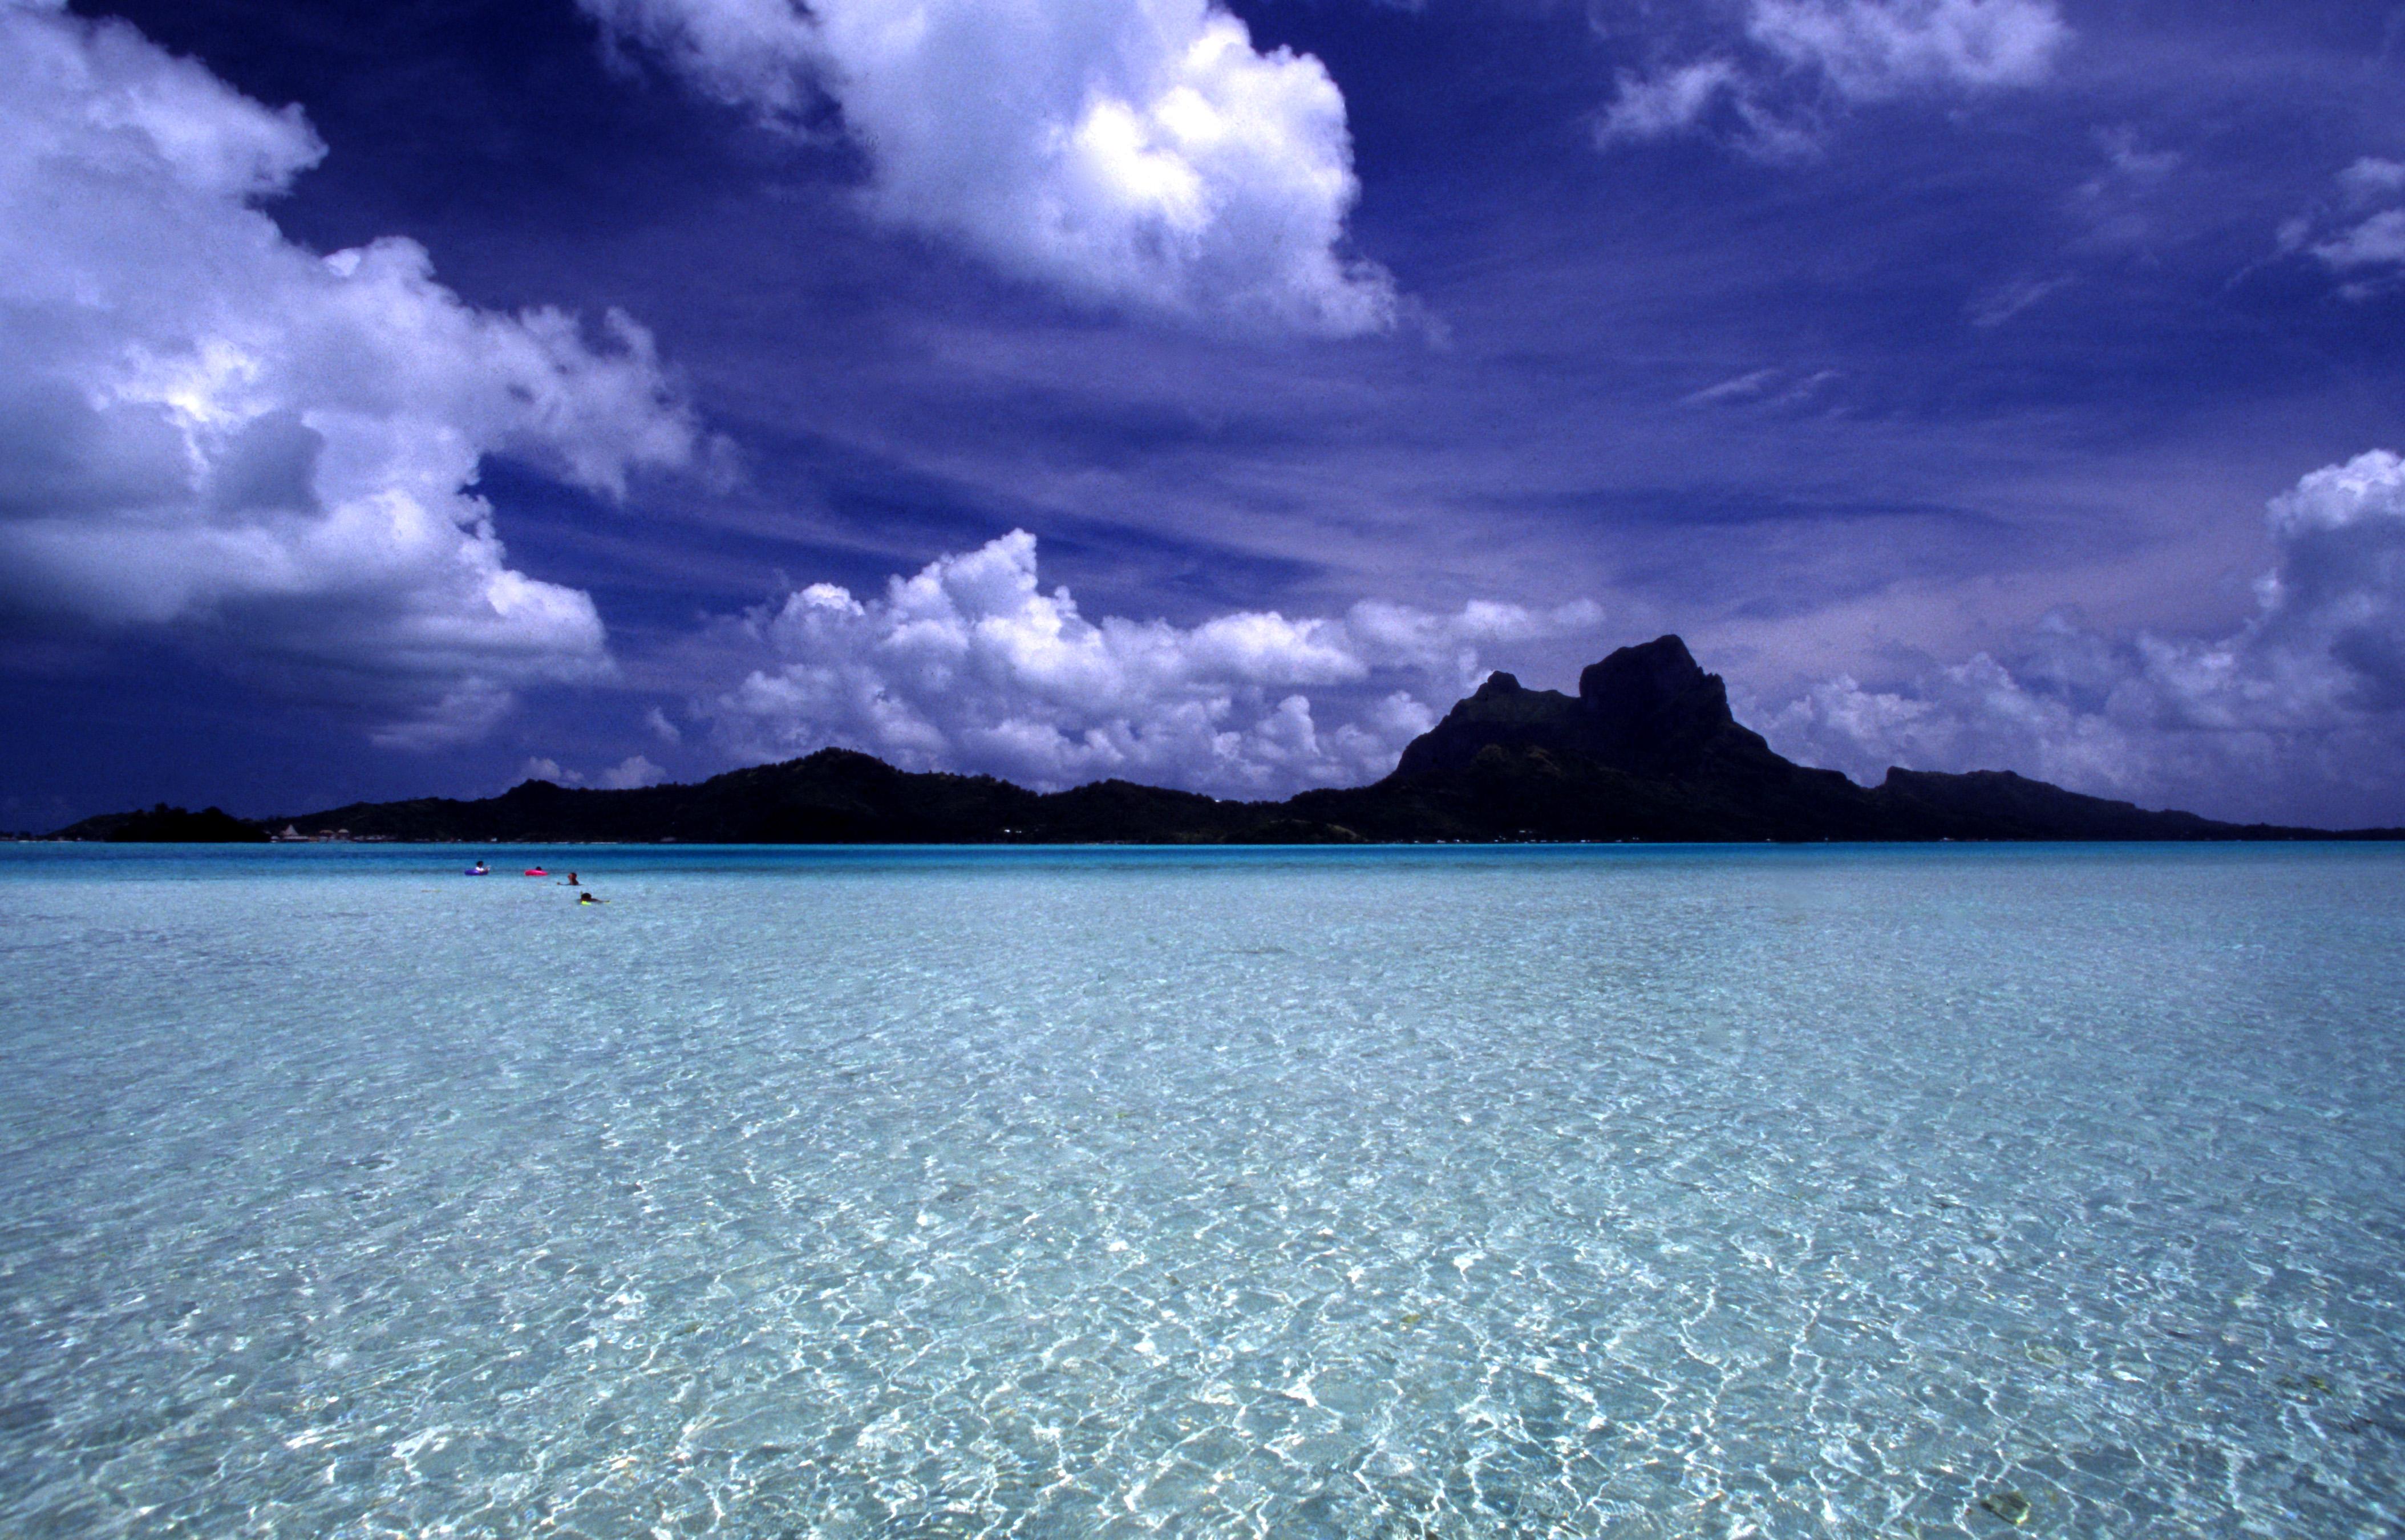 Bora Bora, French Polynesia - by Stefan Lins